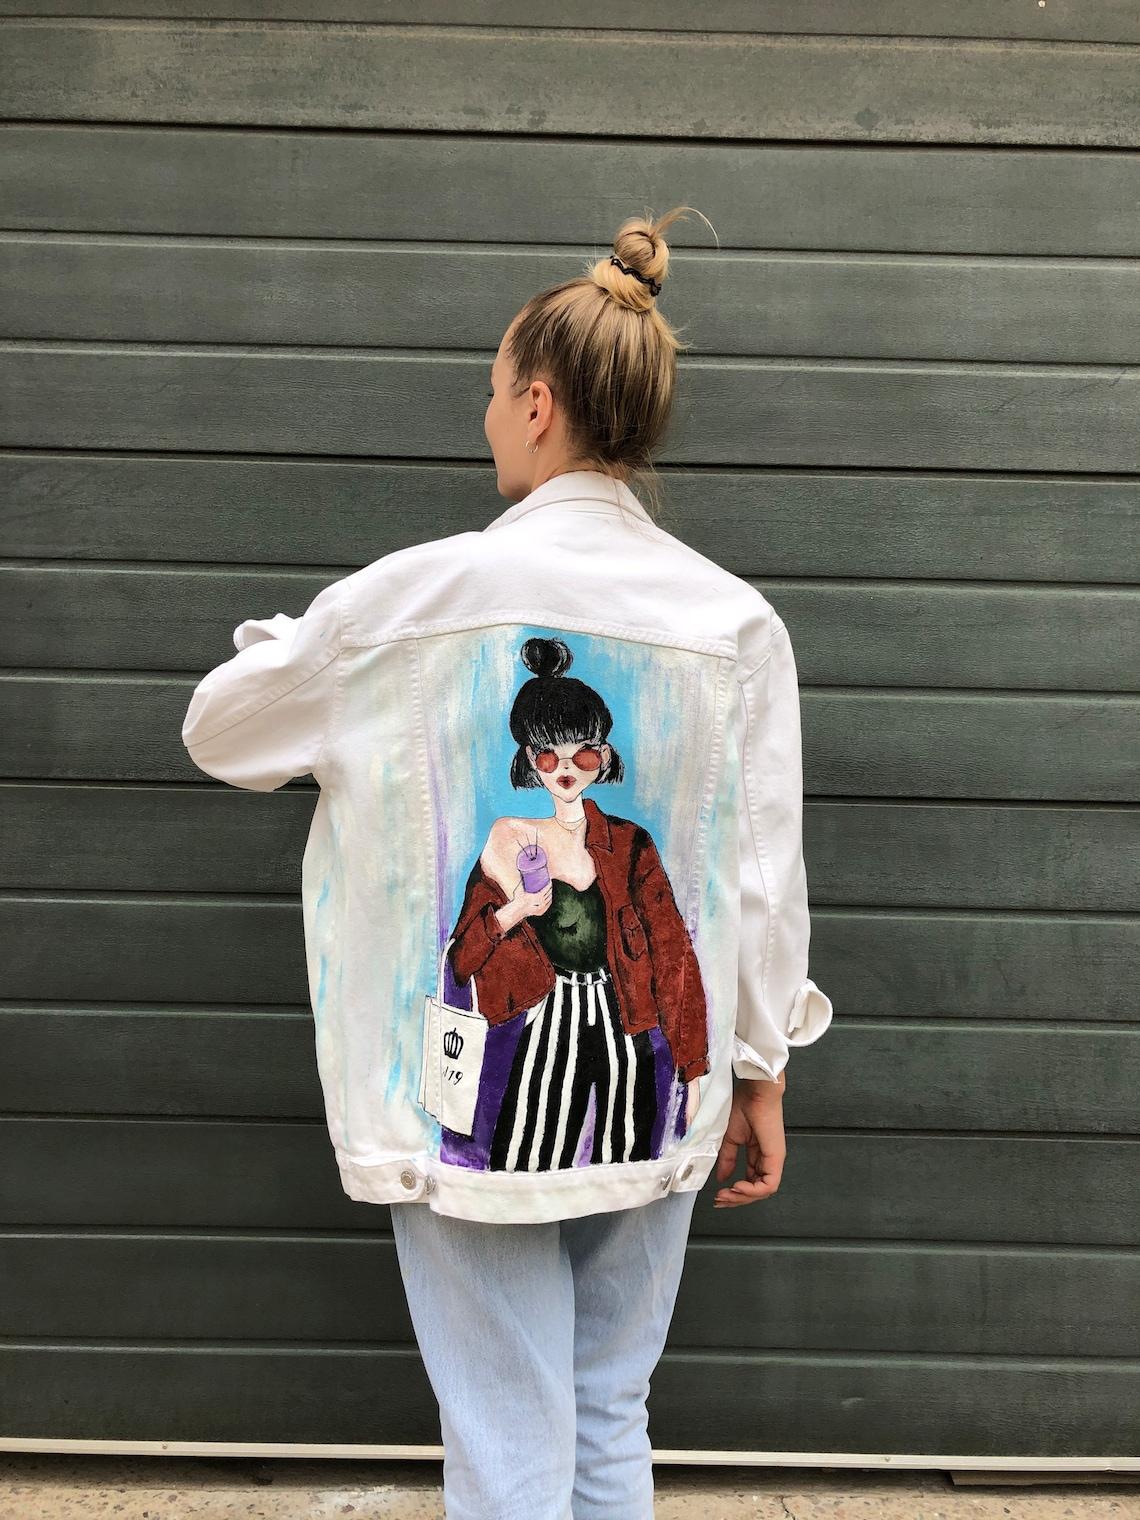 Hand Painted Denim Jean Jacket Clothing Acrylic Handmade Girl Style Vintage Coat Style Fashion Jeans